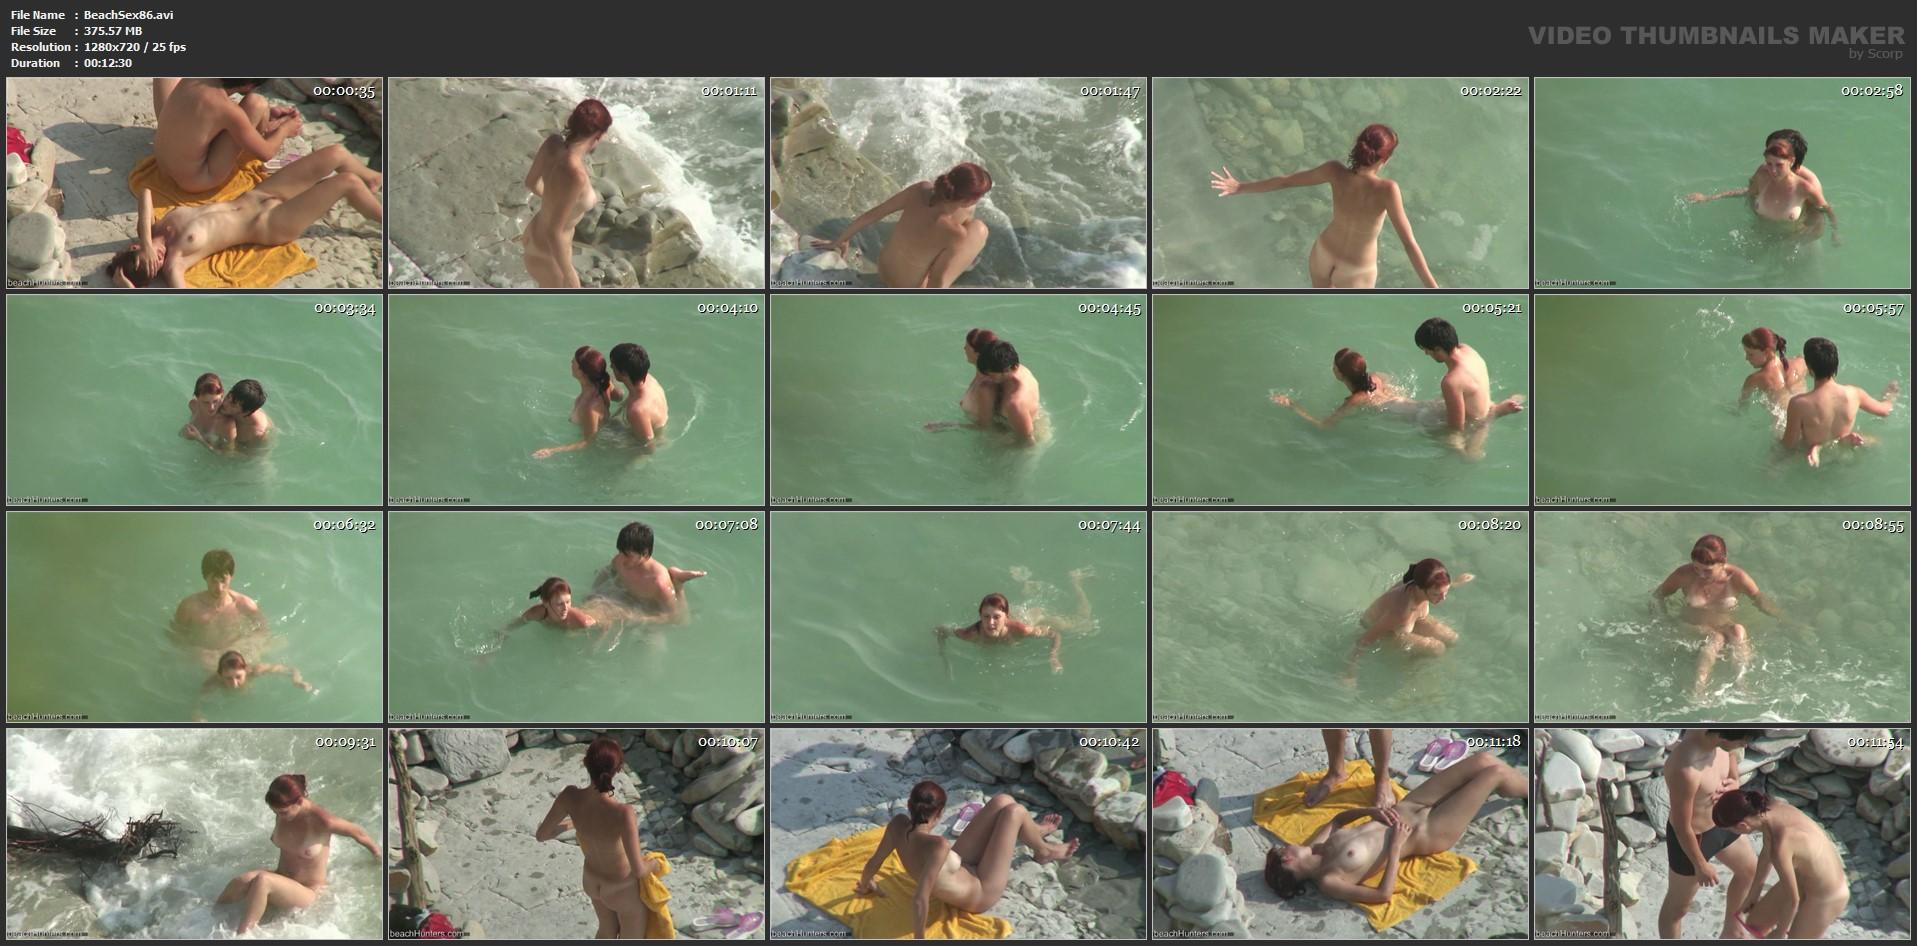 beachsex86-avi